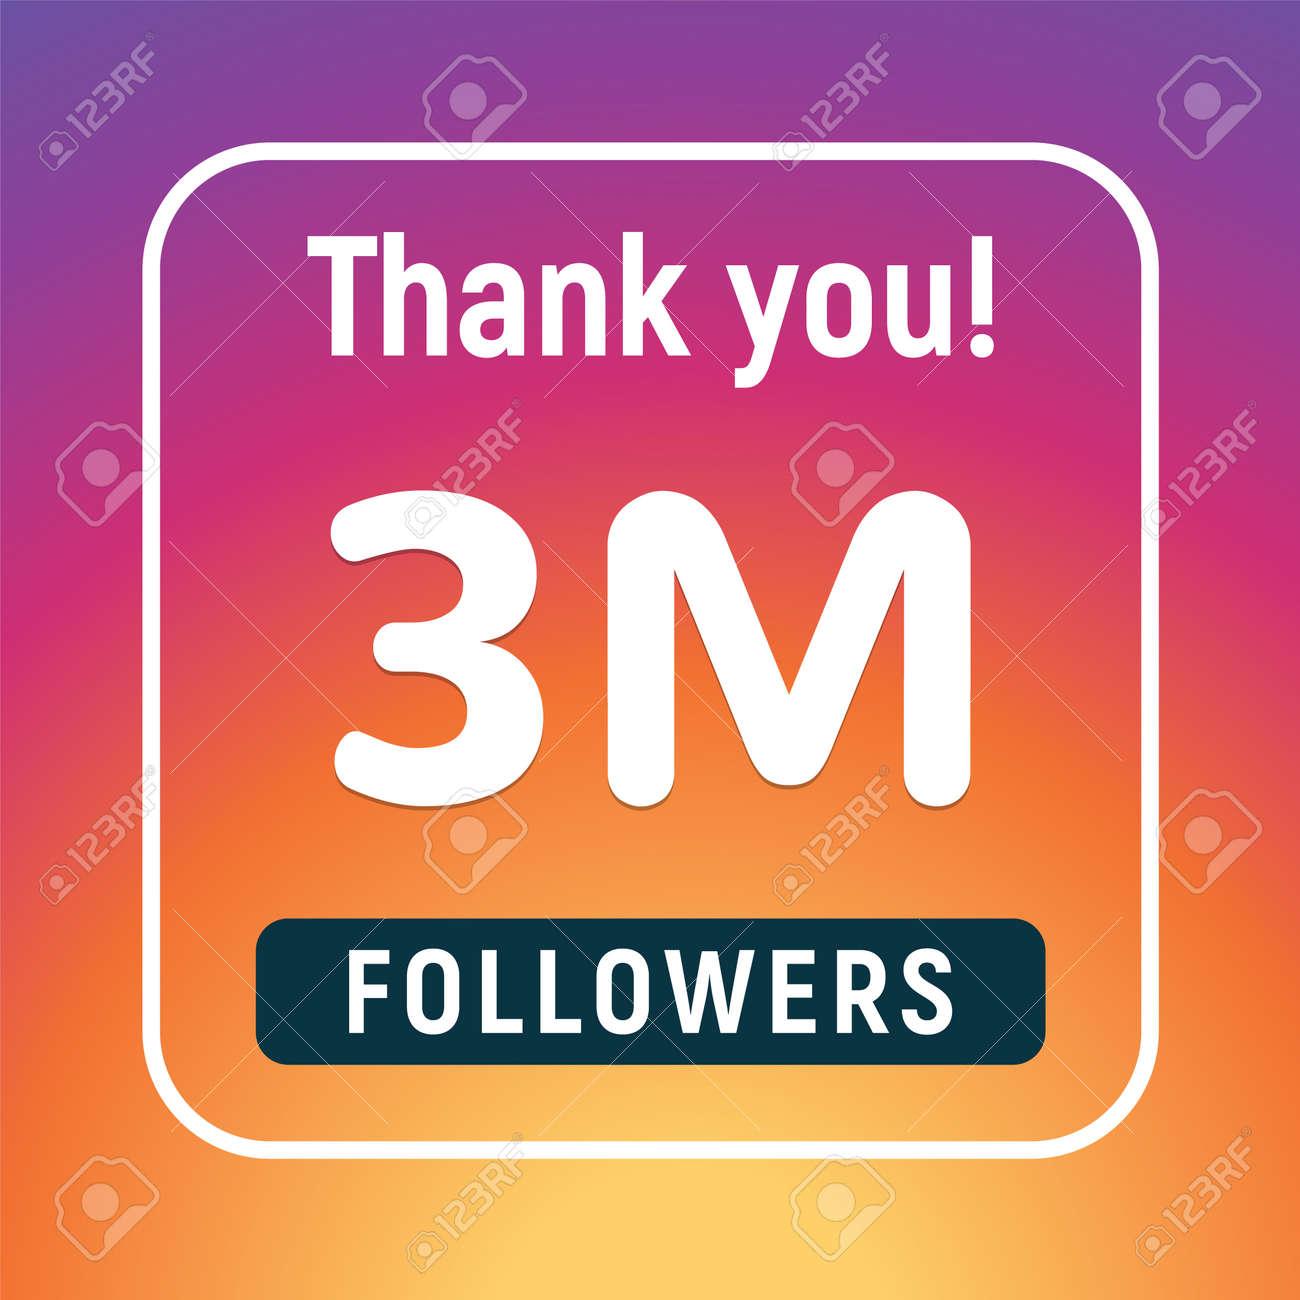 Thank you 3 million followers congratulation subscribe. 3m like follow anniversary - 168953017